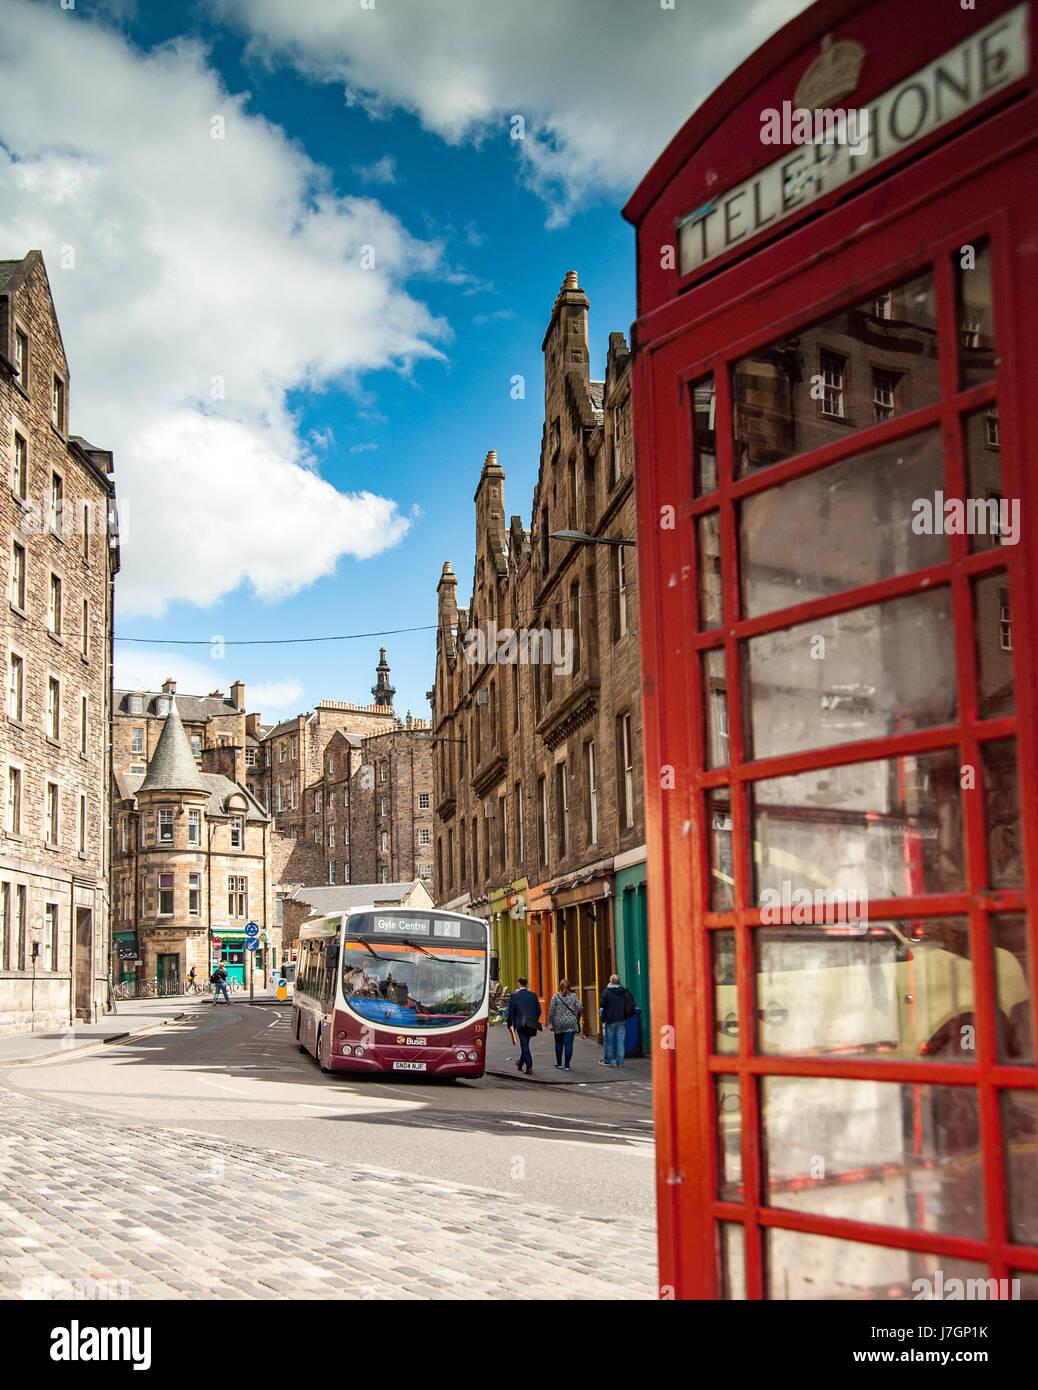 A bus on old street  Candlemaker Row, Edinburgh Scotland Stock Photo